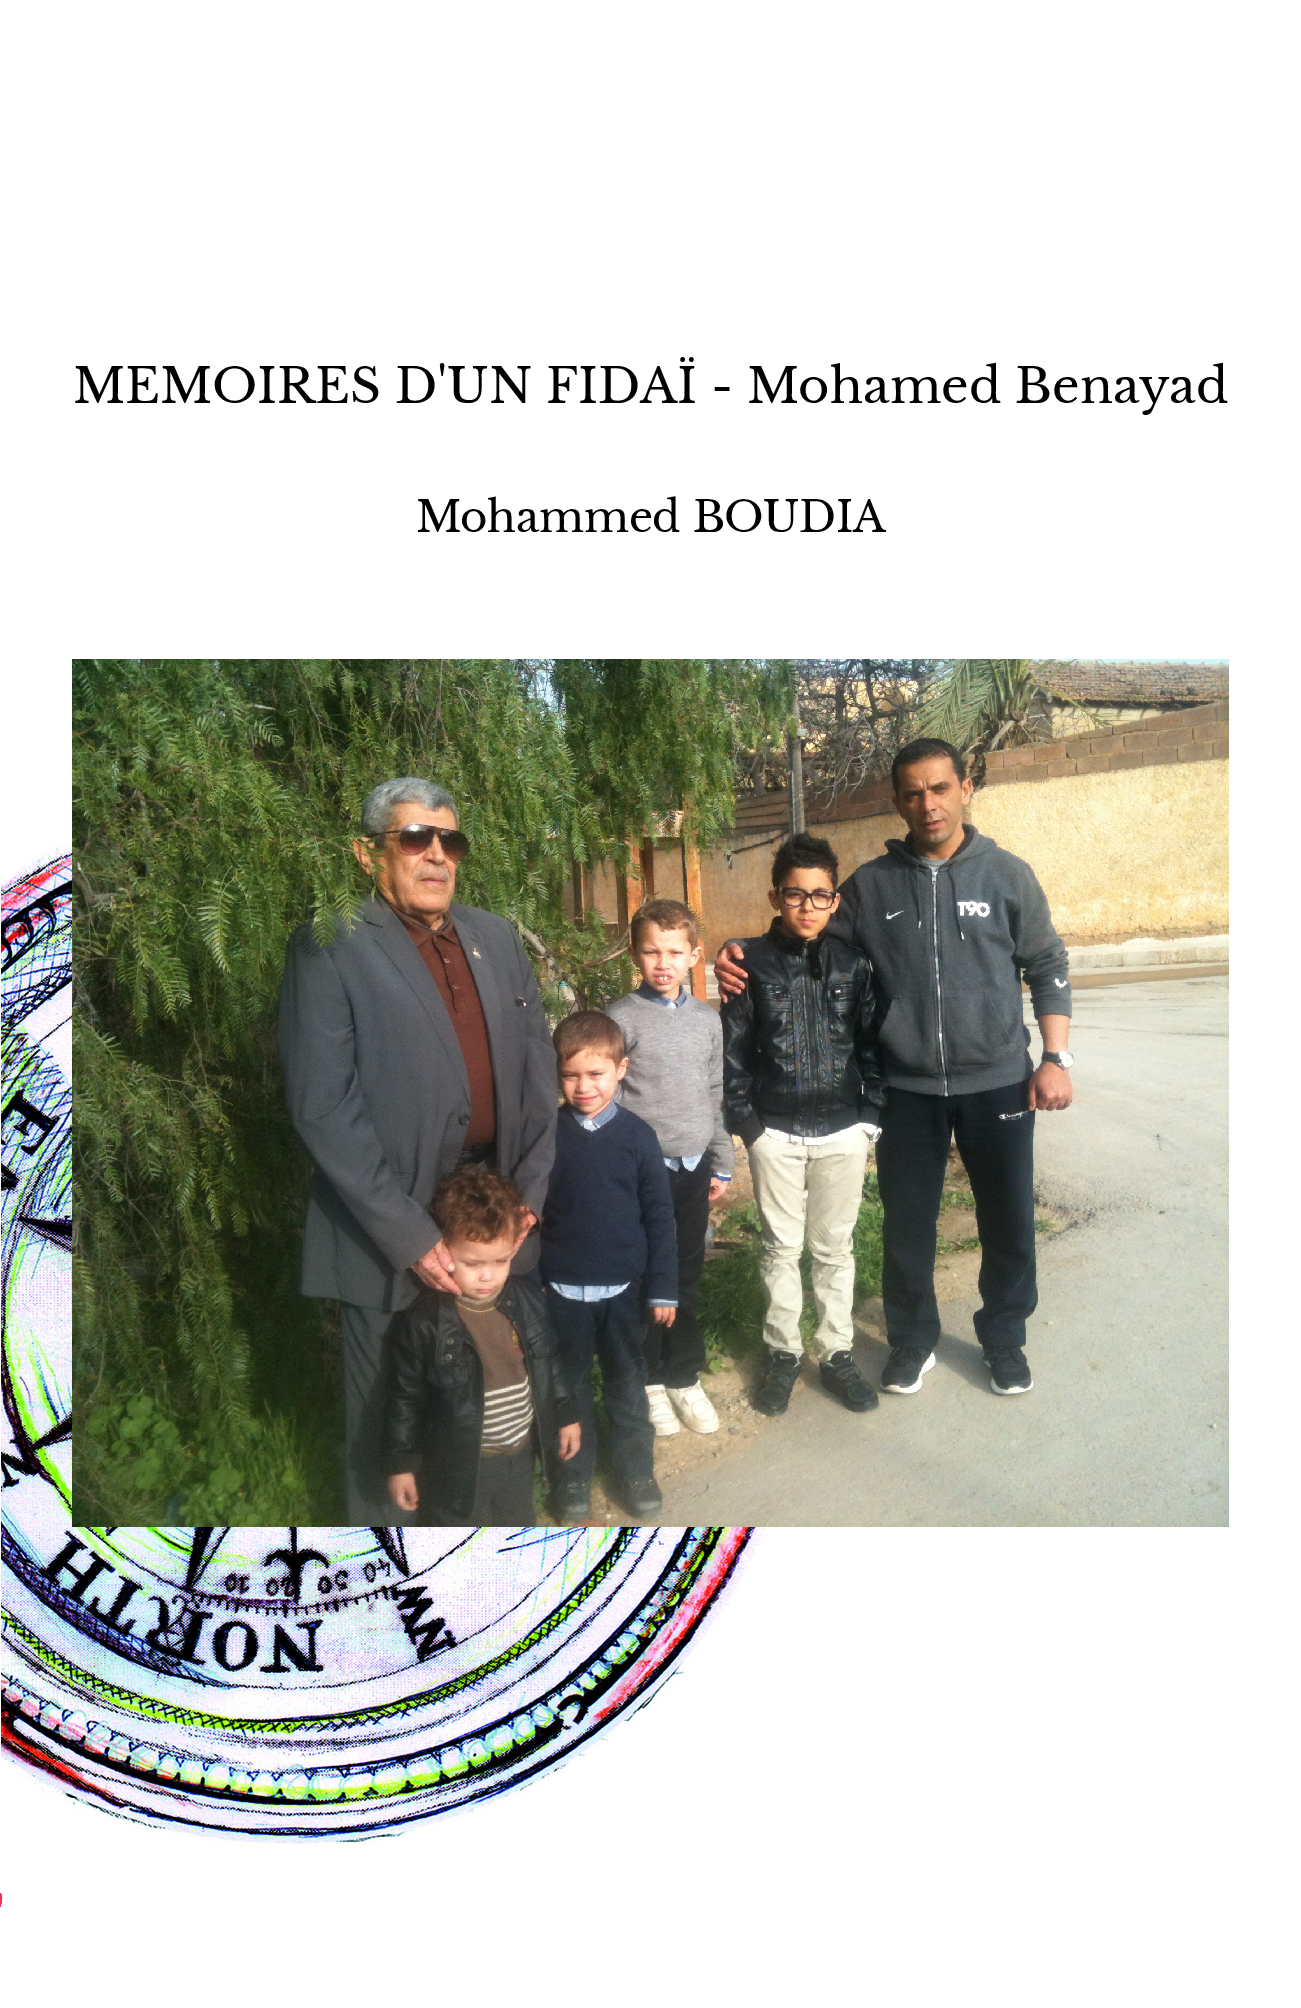 MEMOIRES D'UN FIDAÏ - Mohamed Benayad